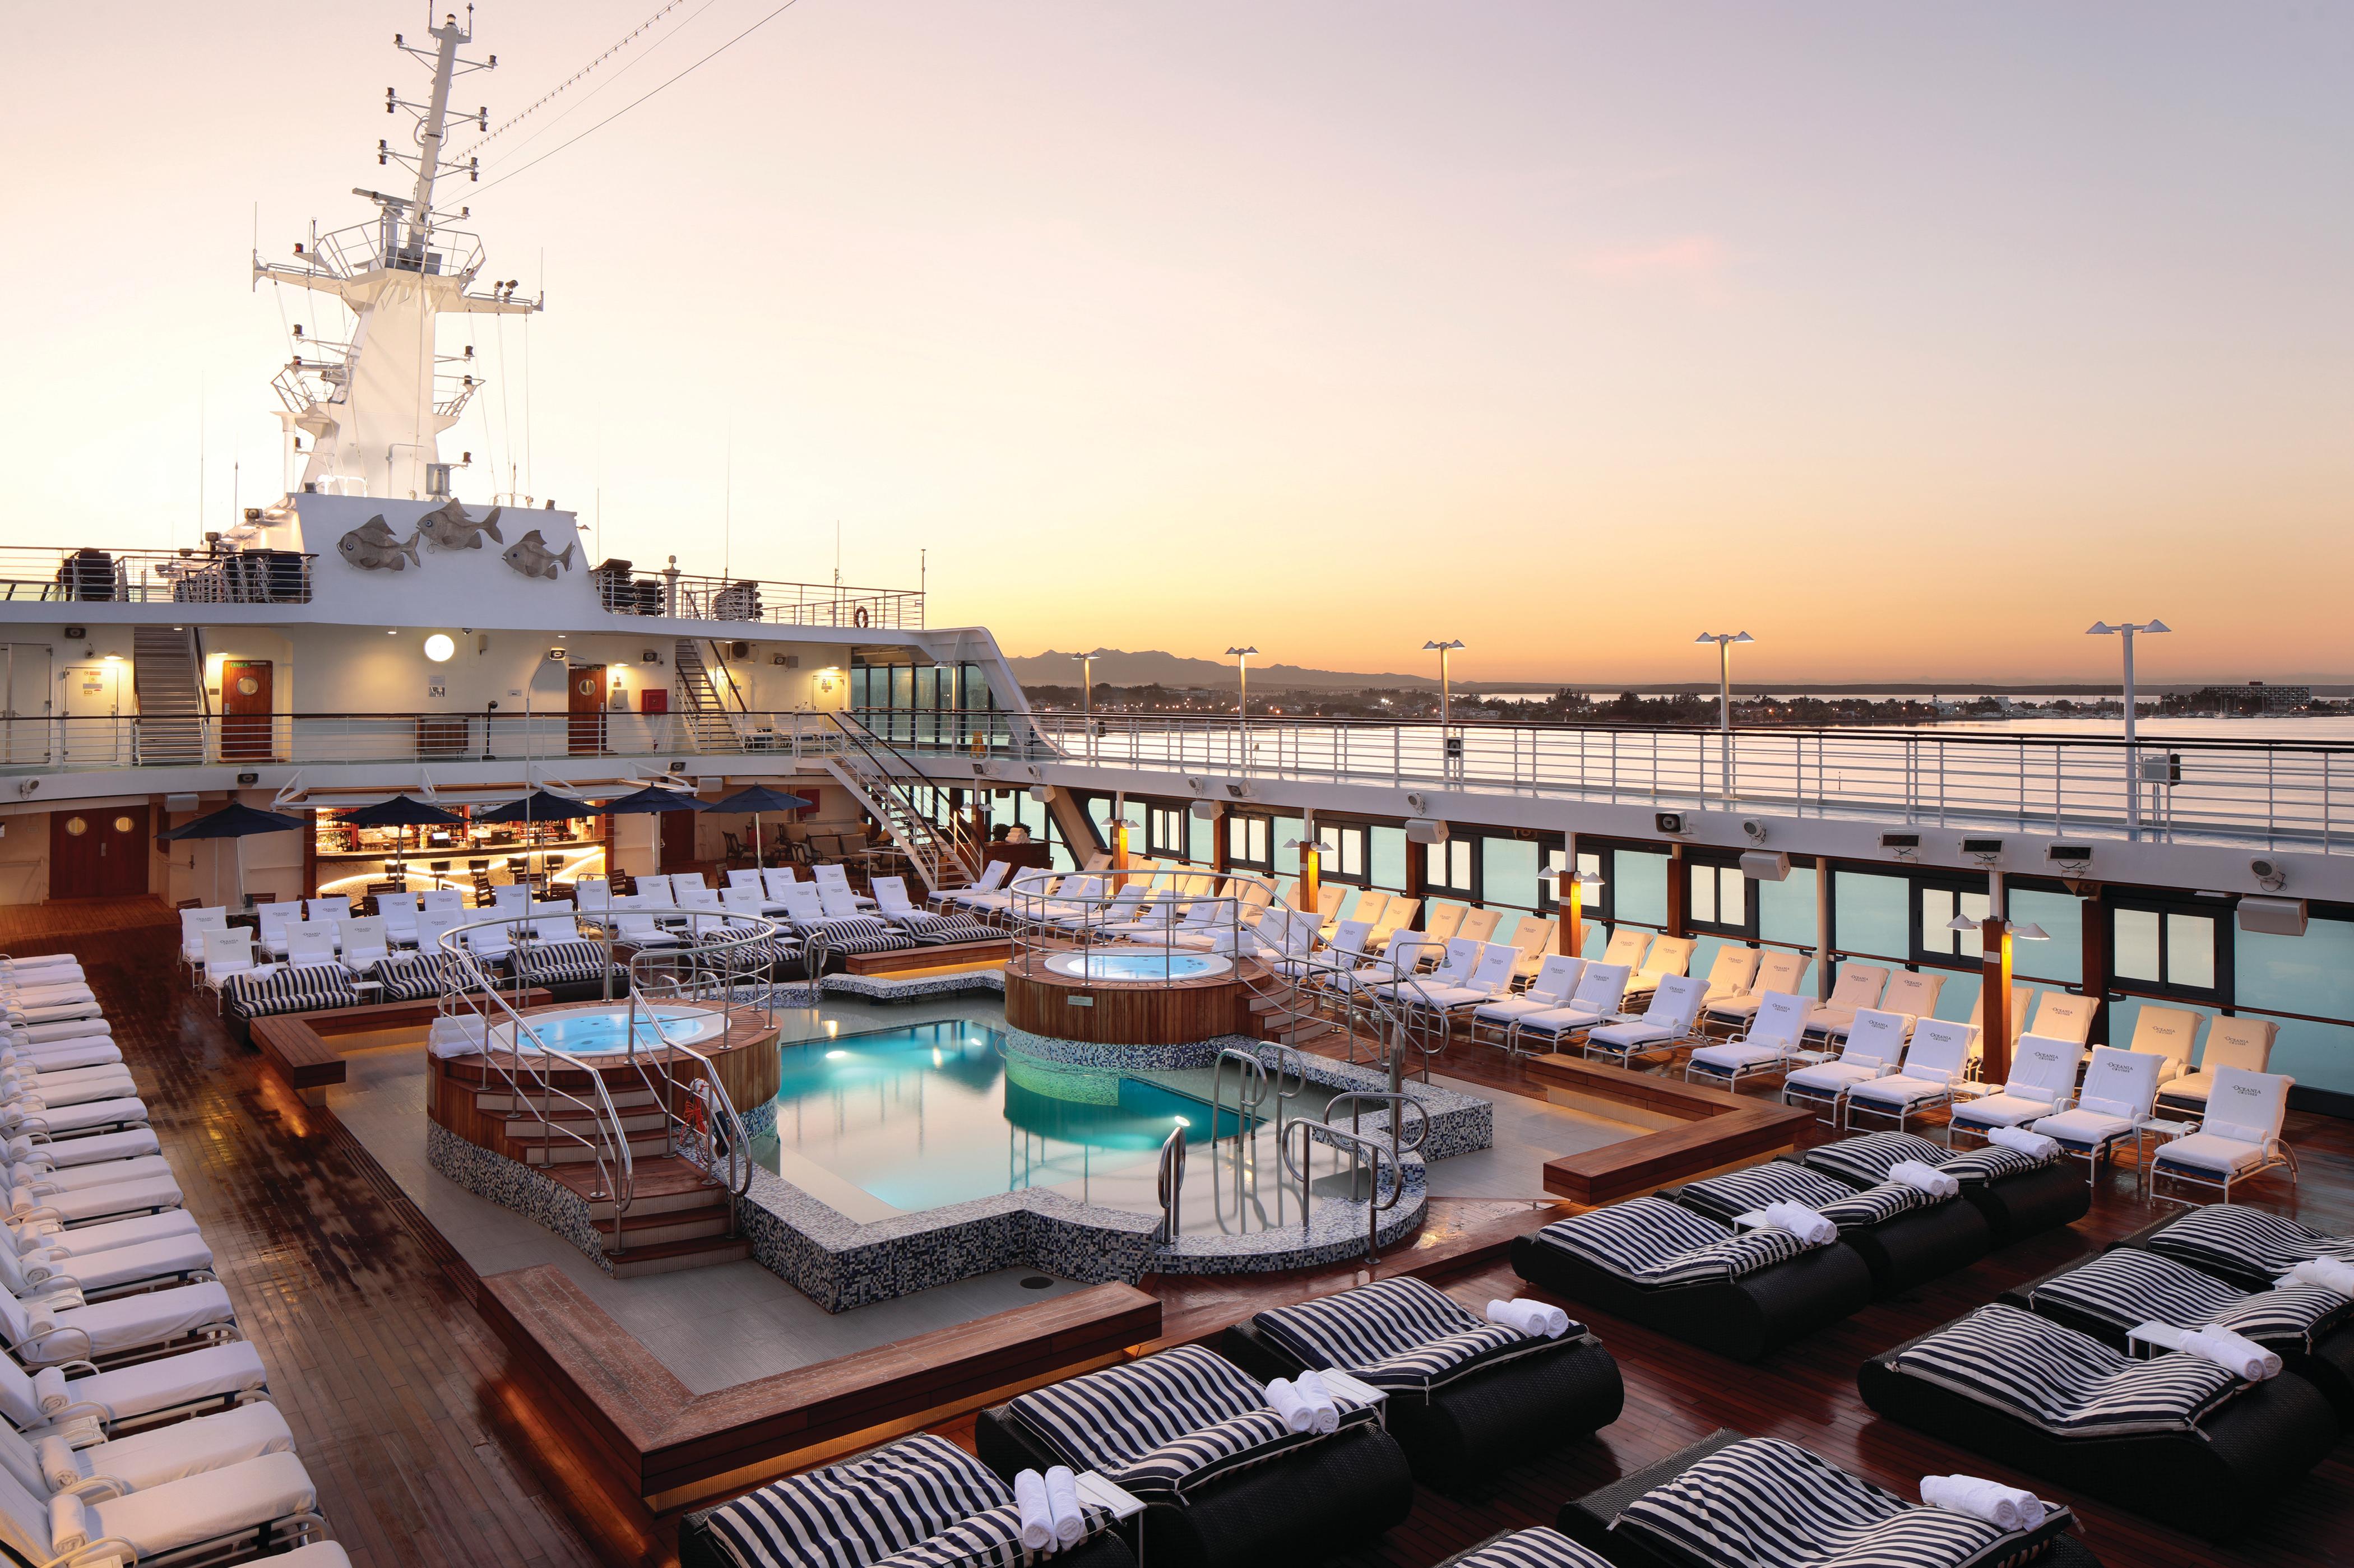 Oceania Insignia - Pool deck